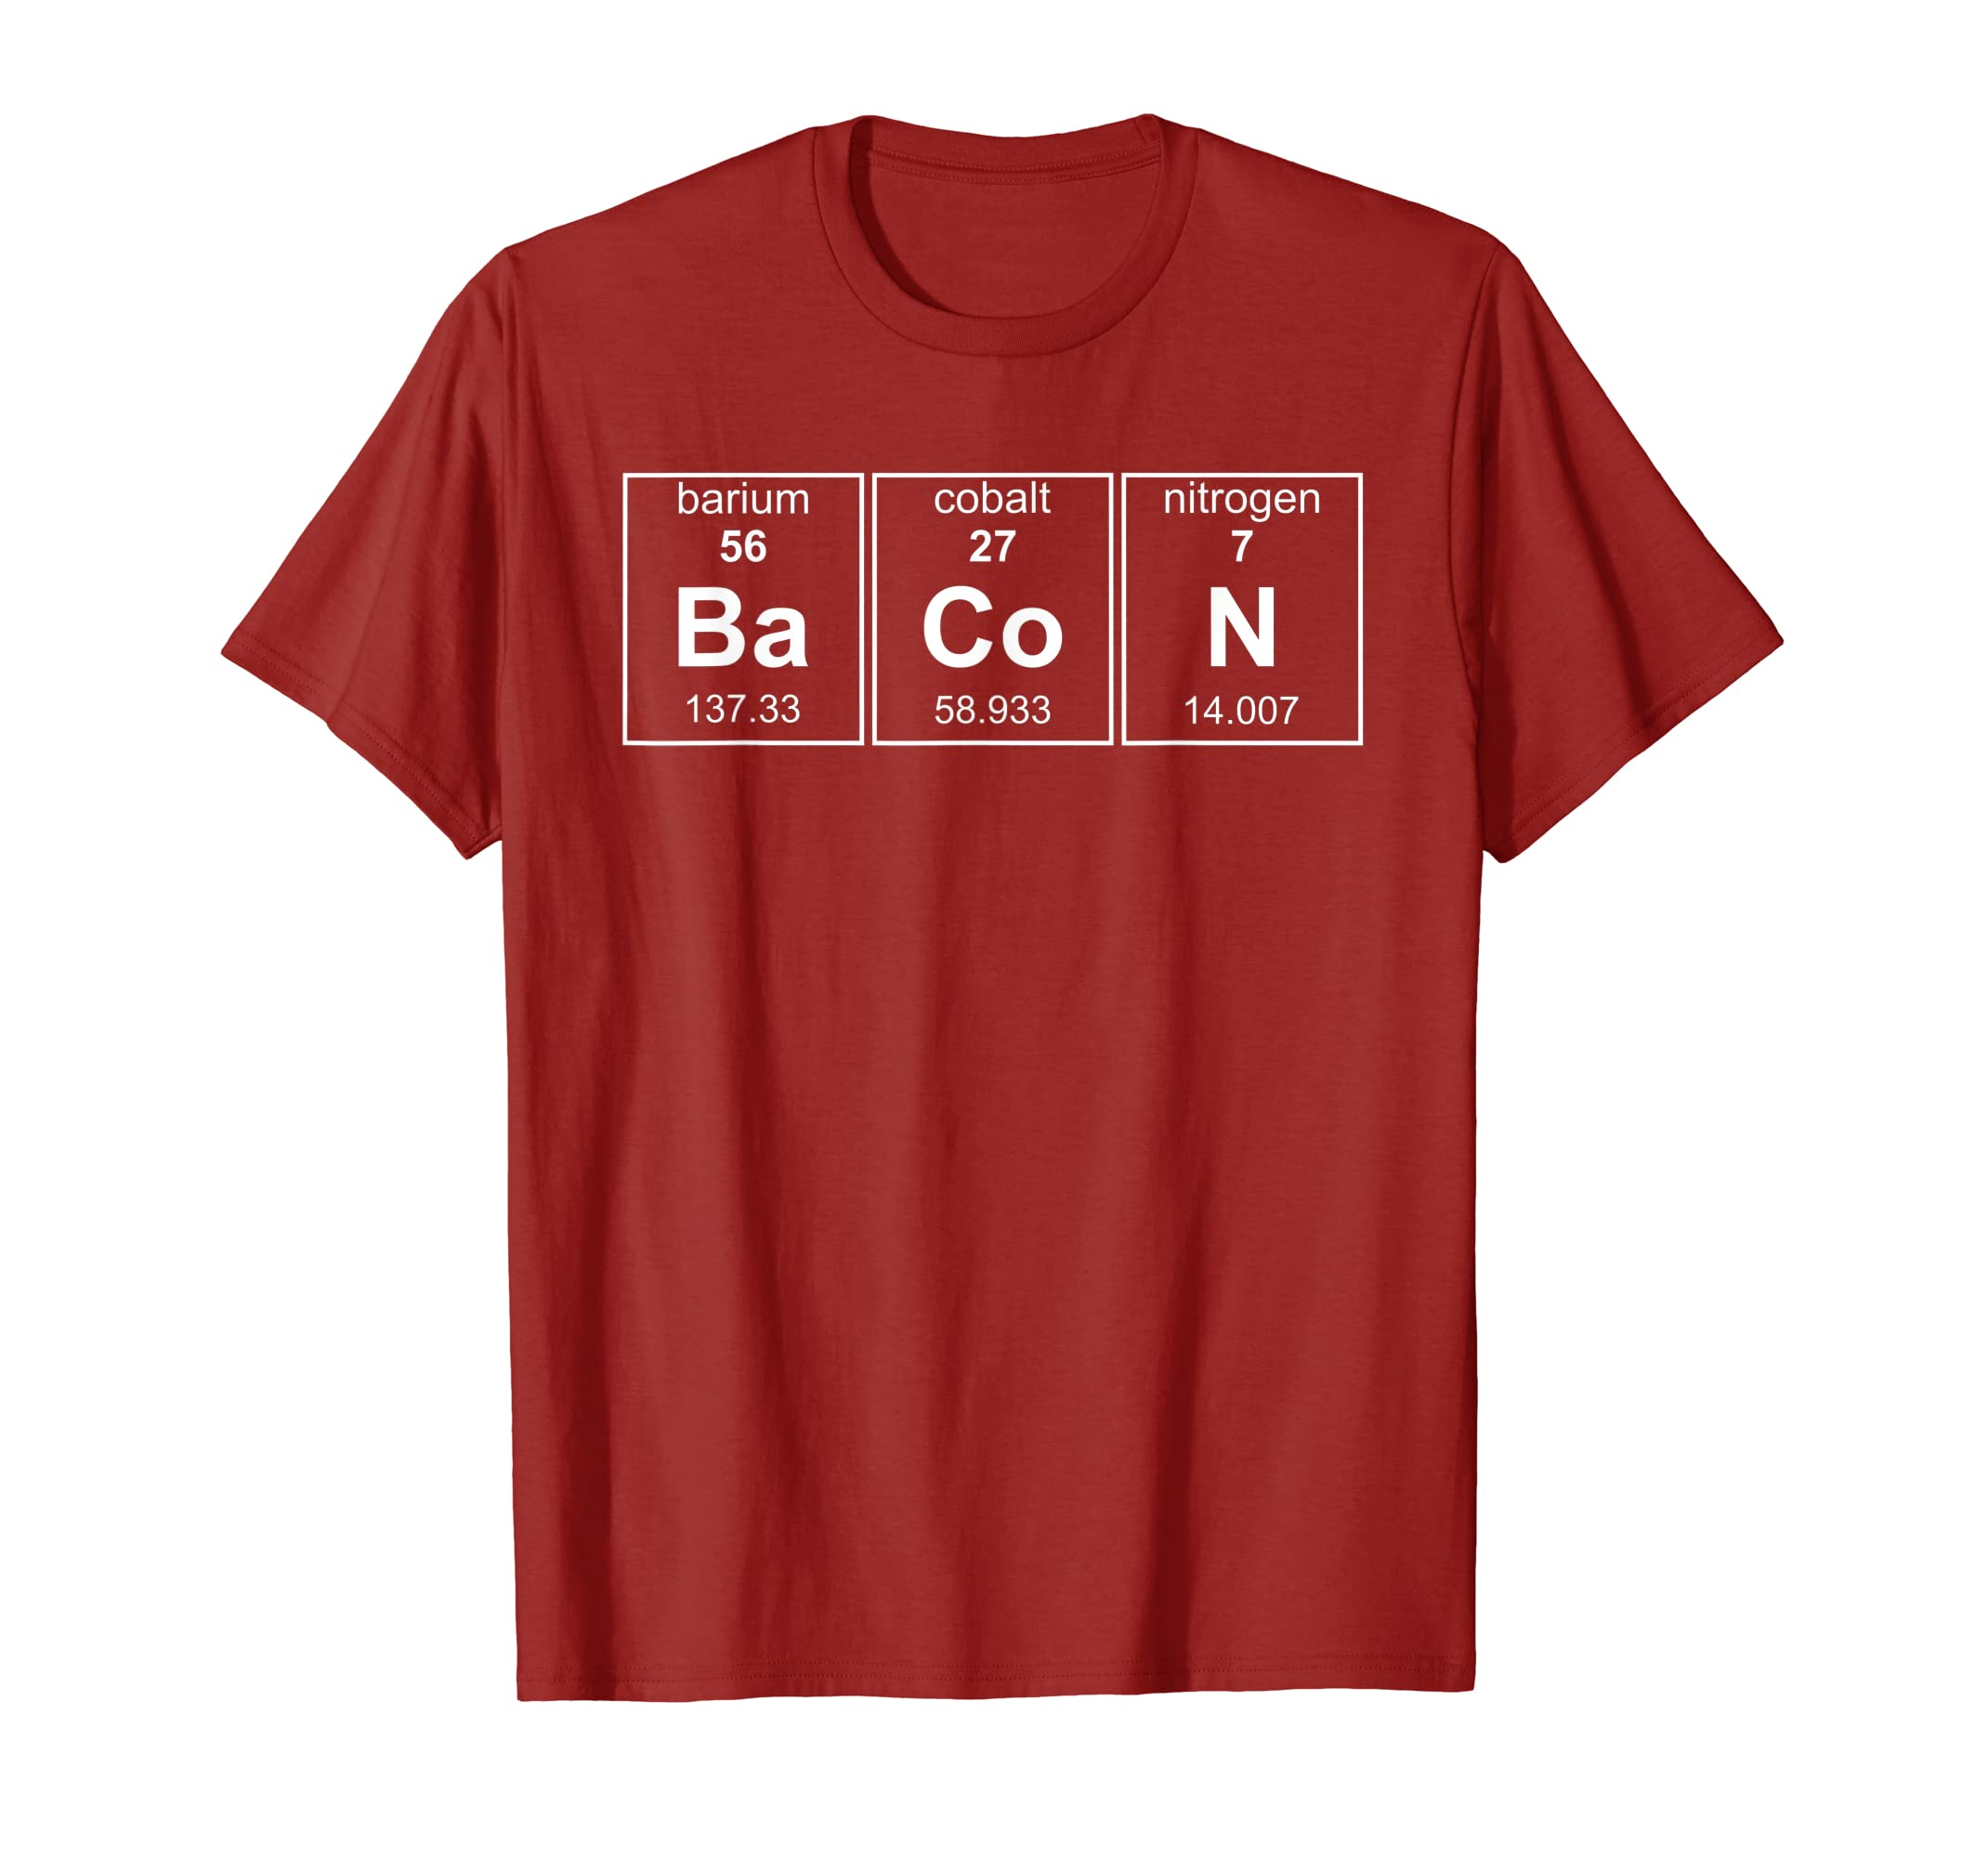 803549b8f8 Amazon.com: Bacon Chemistry Periodic Table Funny Novelty Tshirt: Clothing